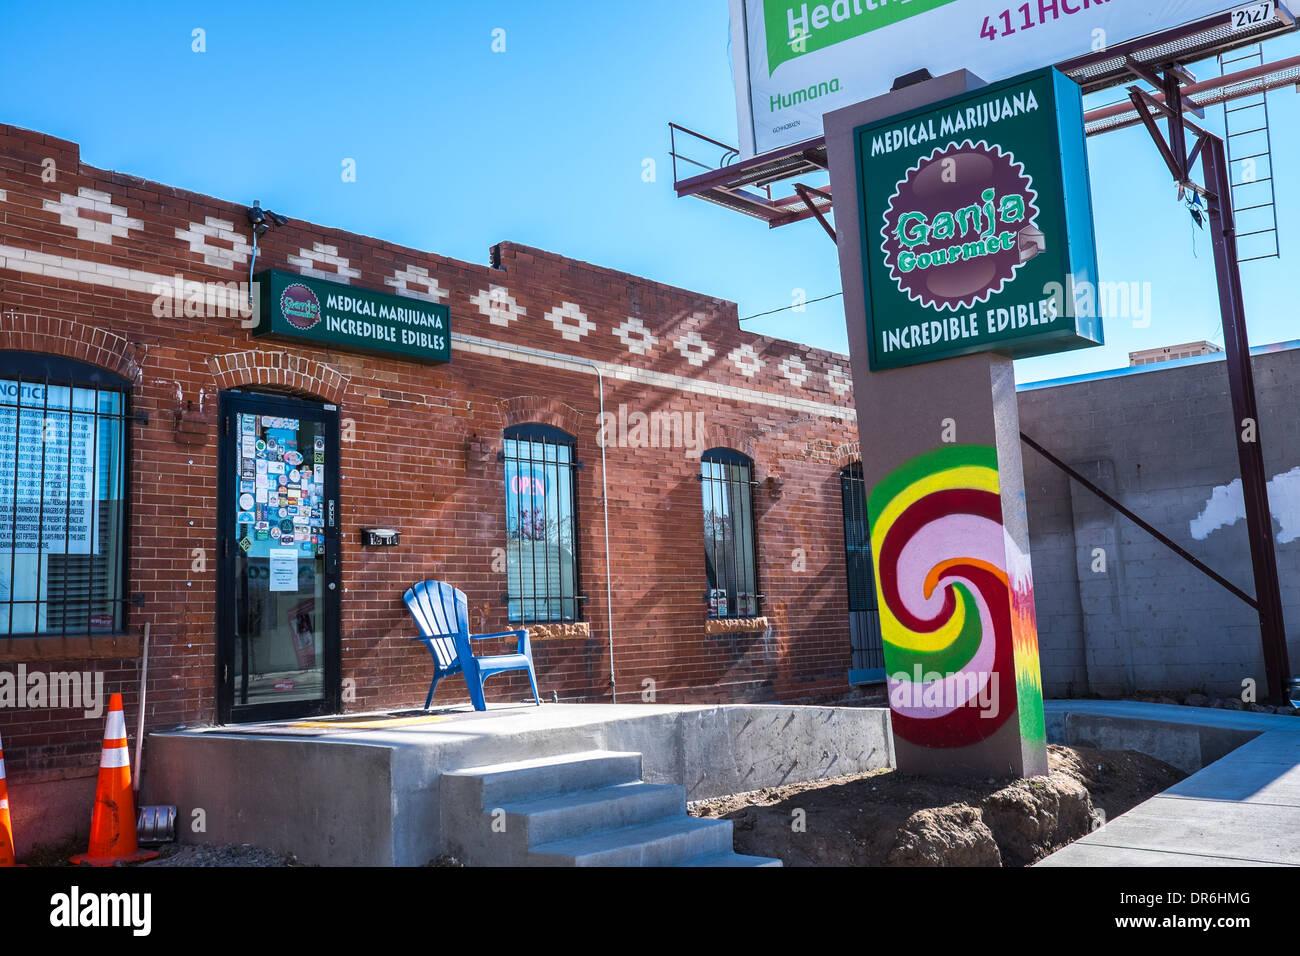 Ganja Gourmet Medical Marijuana Edibles. Denver Colorado off Broadway. - Stock Image